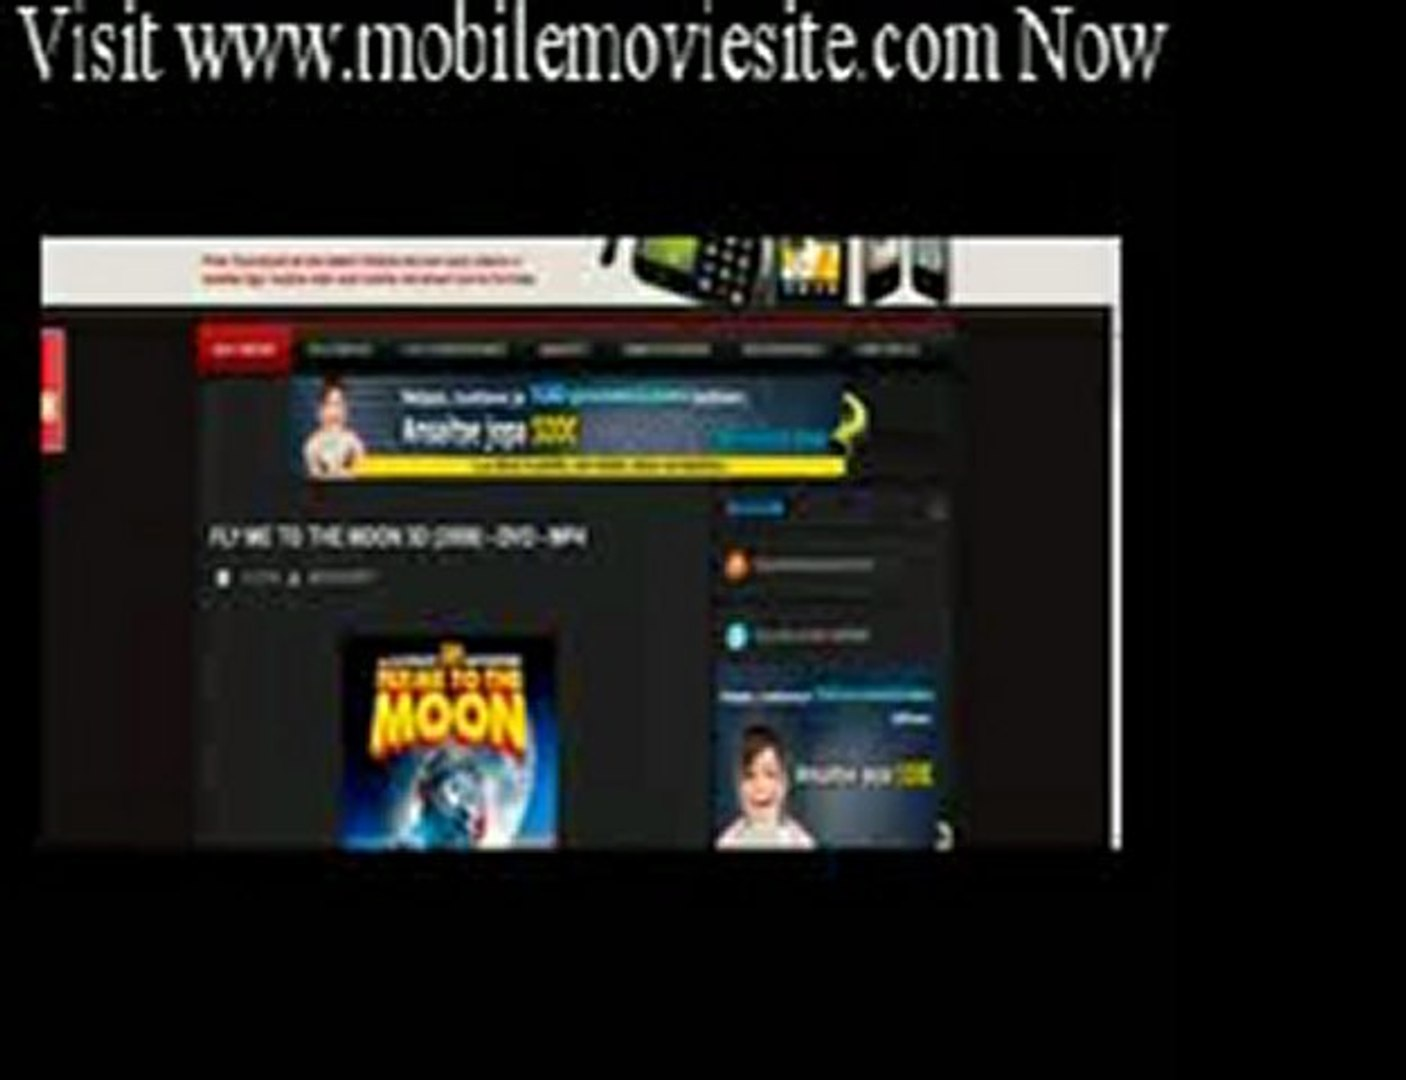 How to download free mobile movies (Avi_ 3gp_ Mp4) -www.mobilemoviesite.com